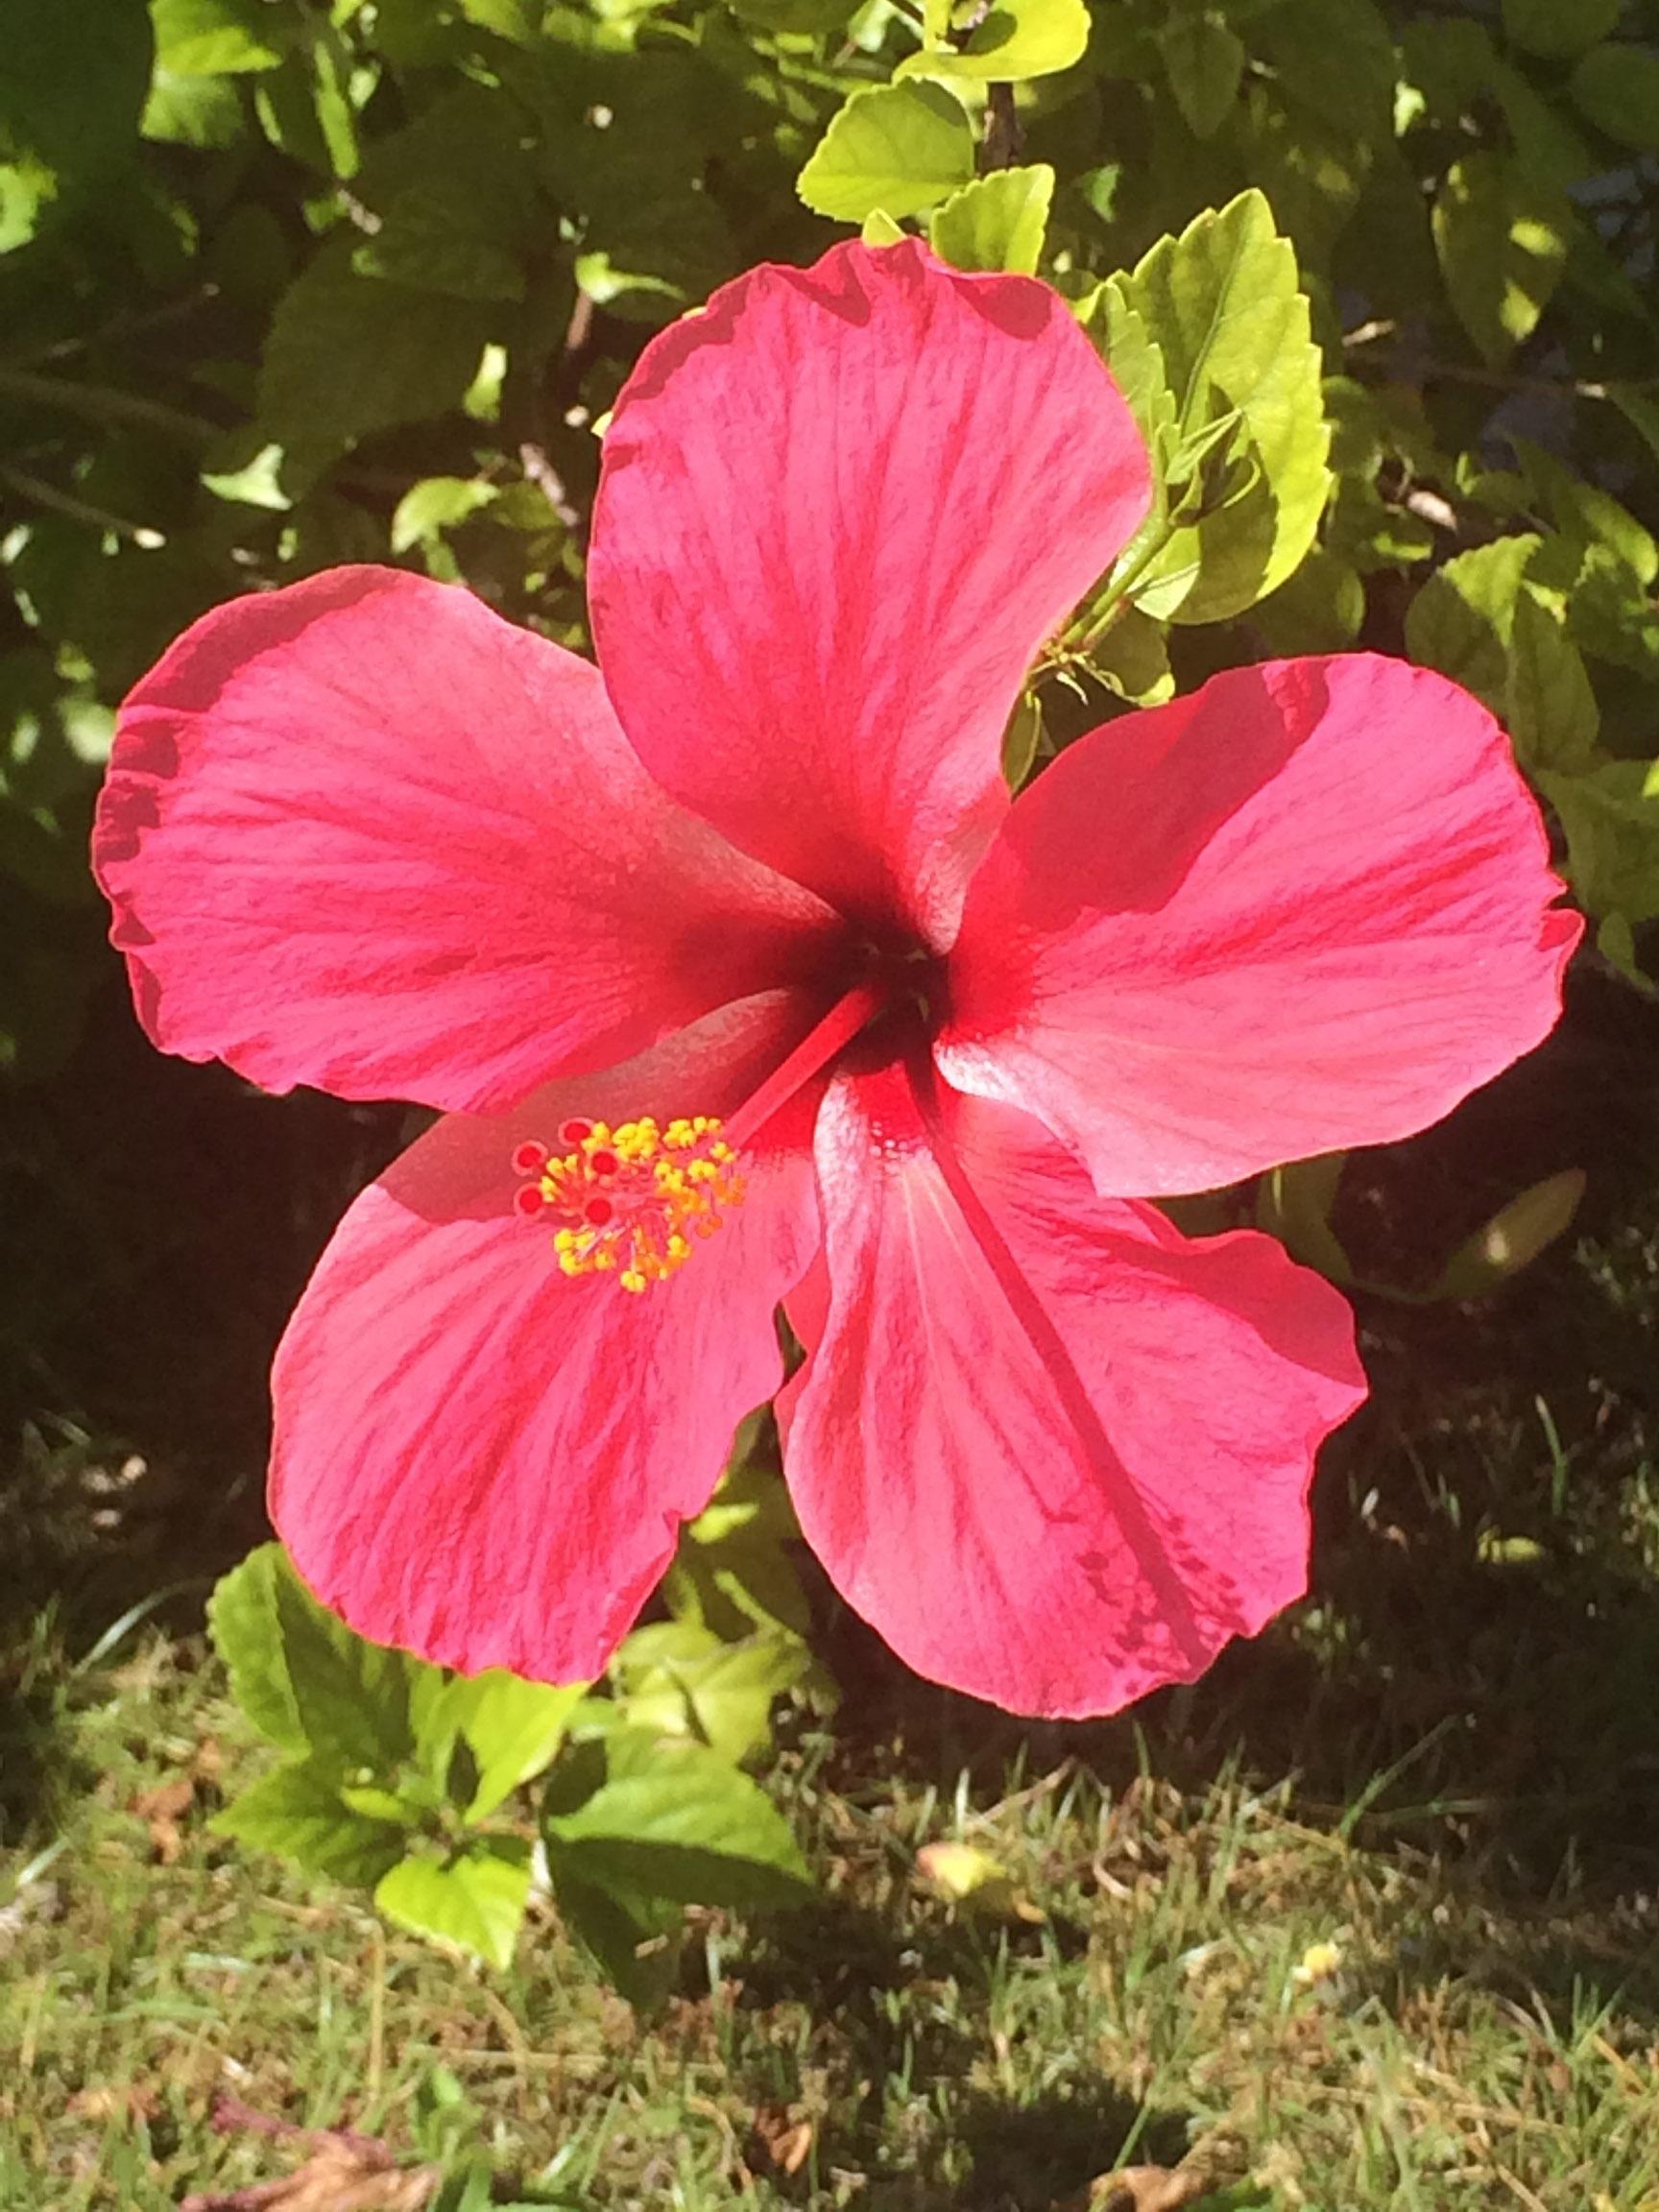 © Te Mana Travels — Hibiscus flower